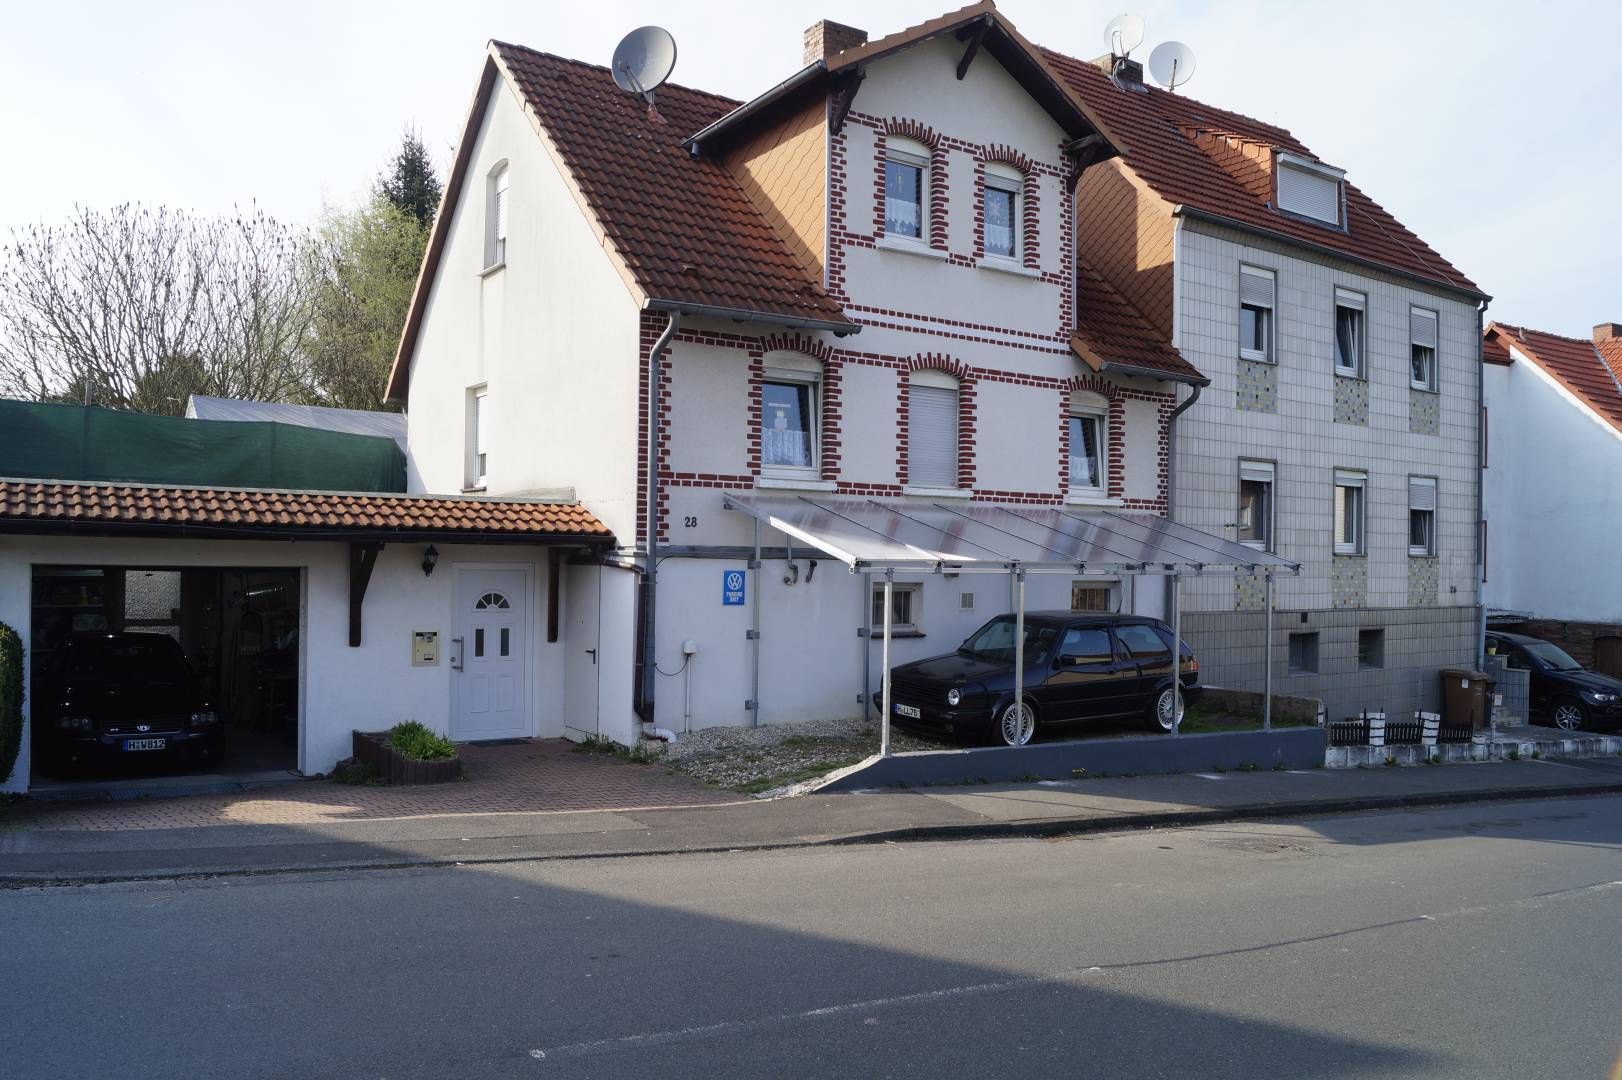 Carport_Aufbau_E03.jpg